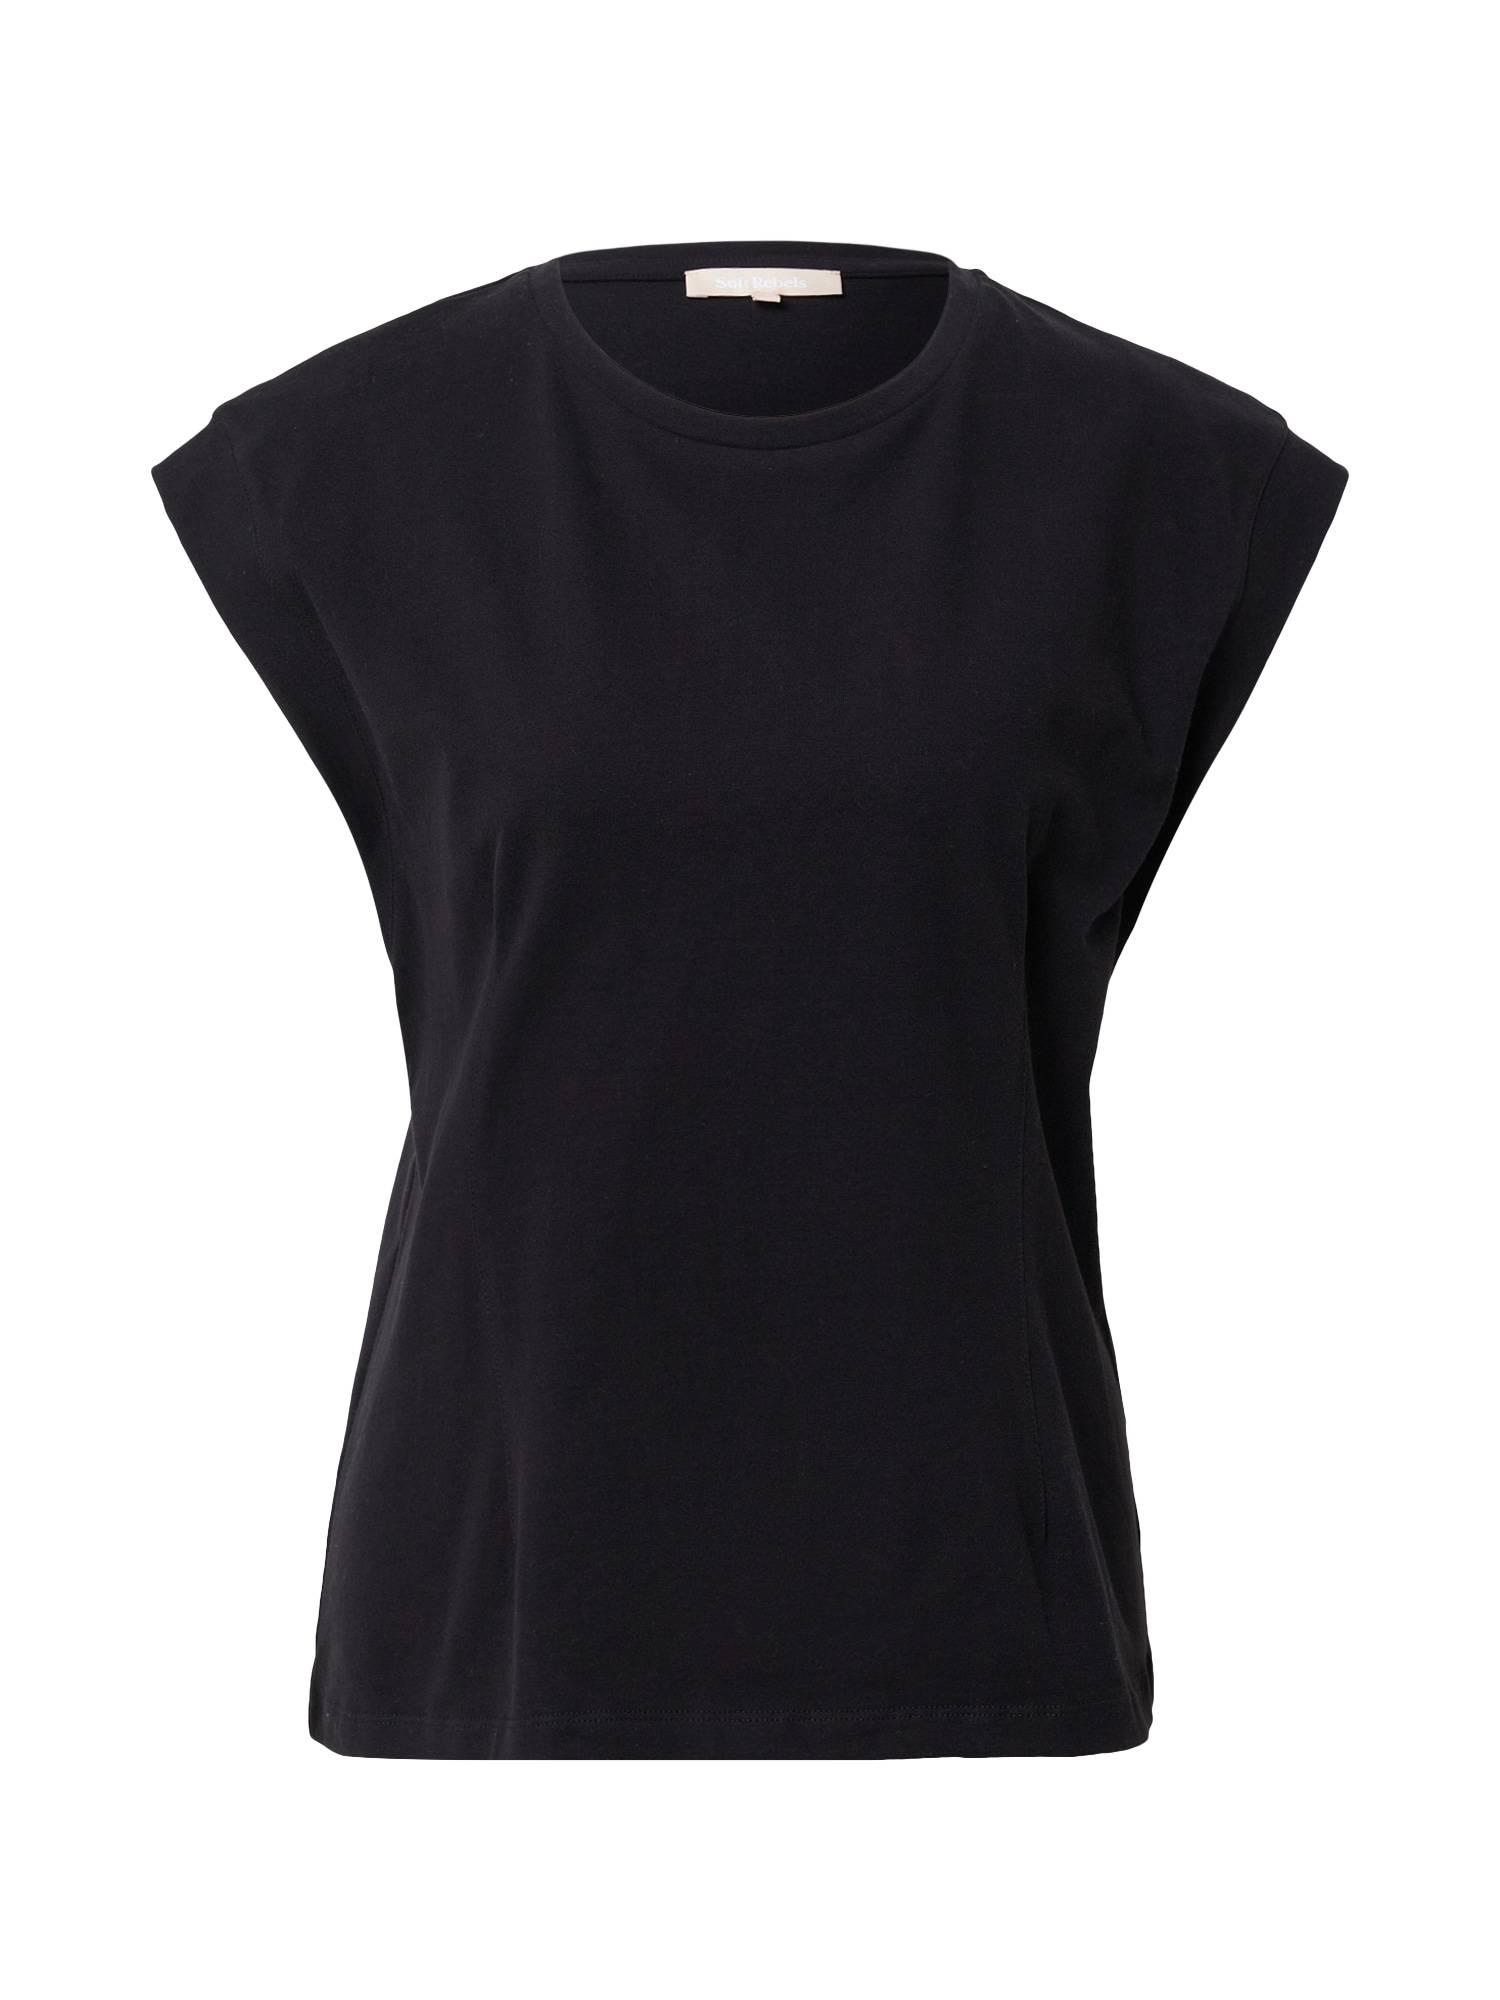 Soft Rebels T-shirt 'Winona'  - Noir - Taille: S - female